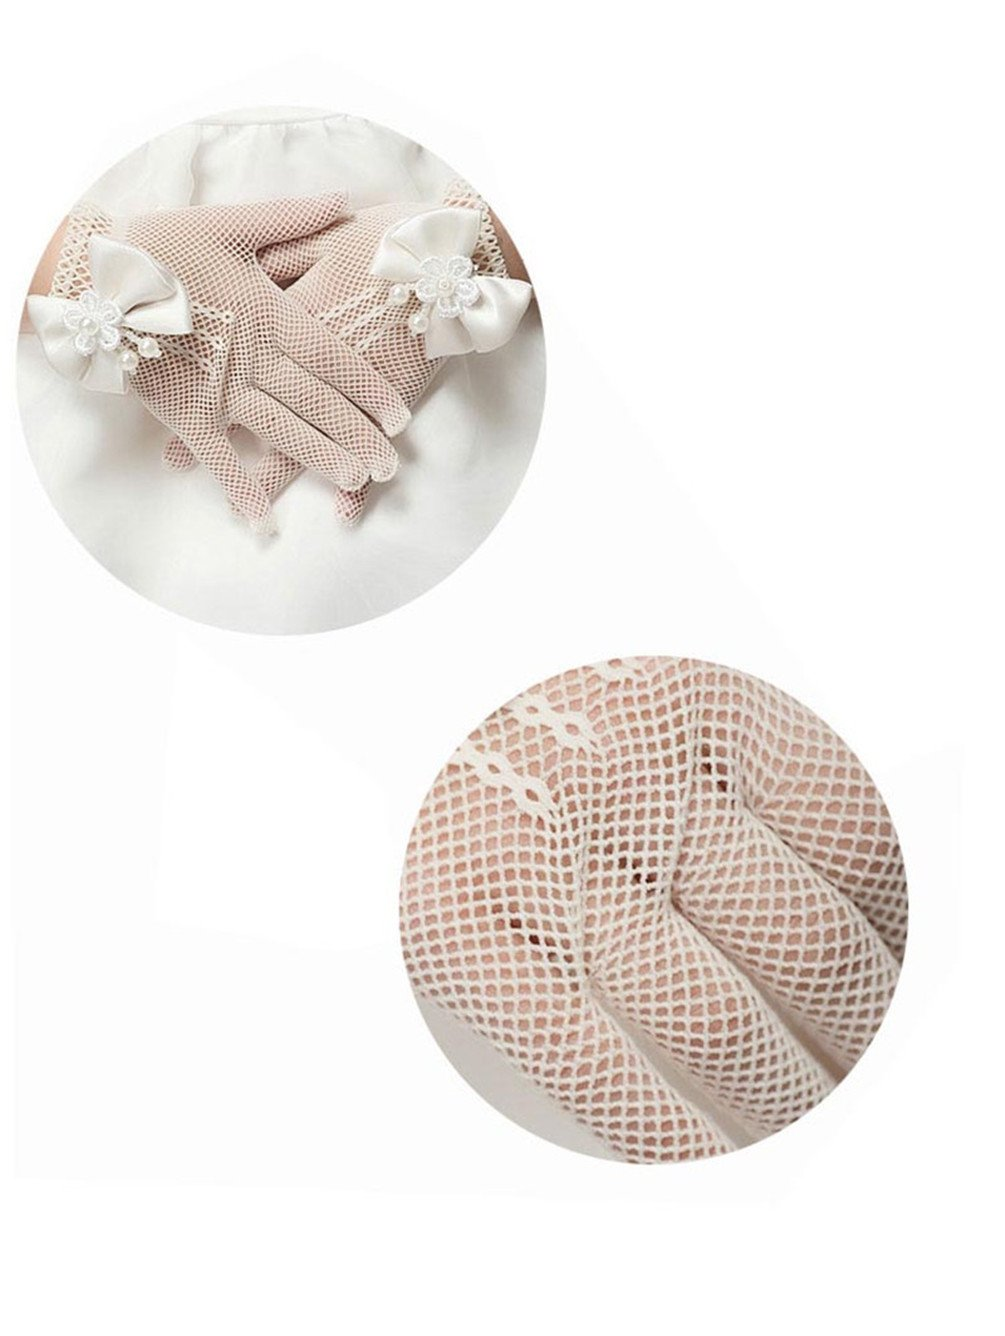 Niyage Pageant Girls Wrist Length Bowknot Net Yarn Gloves (Age 5-13) Ivory